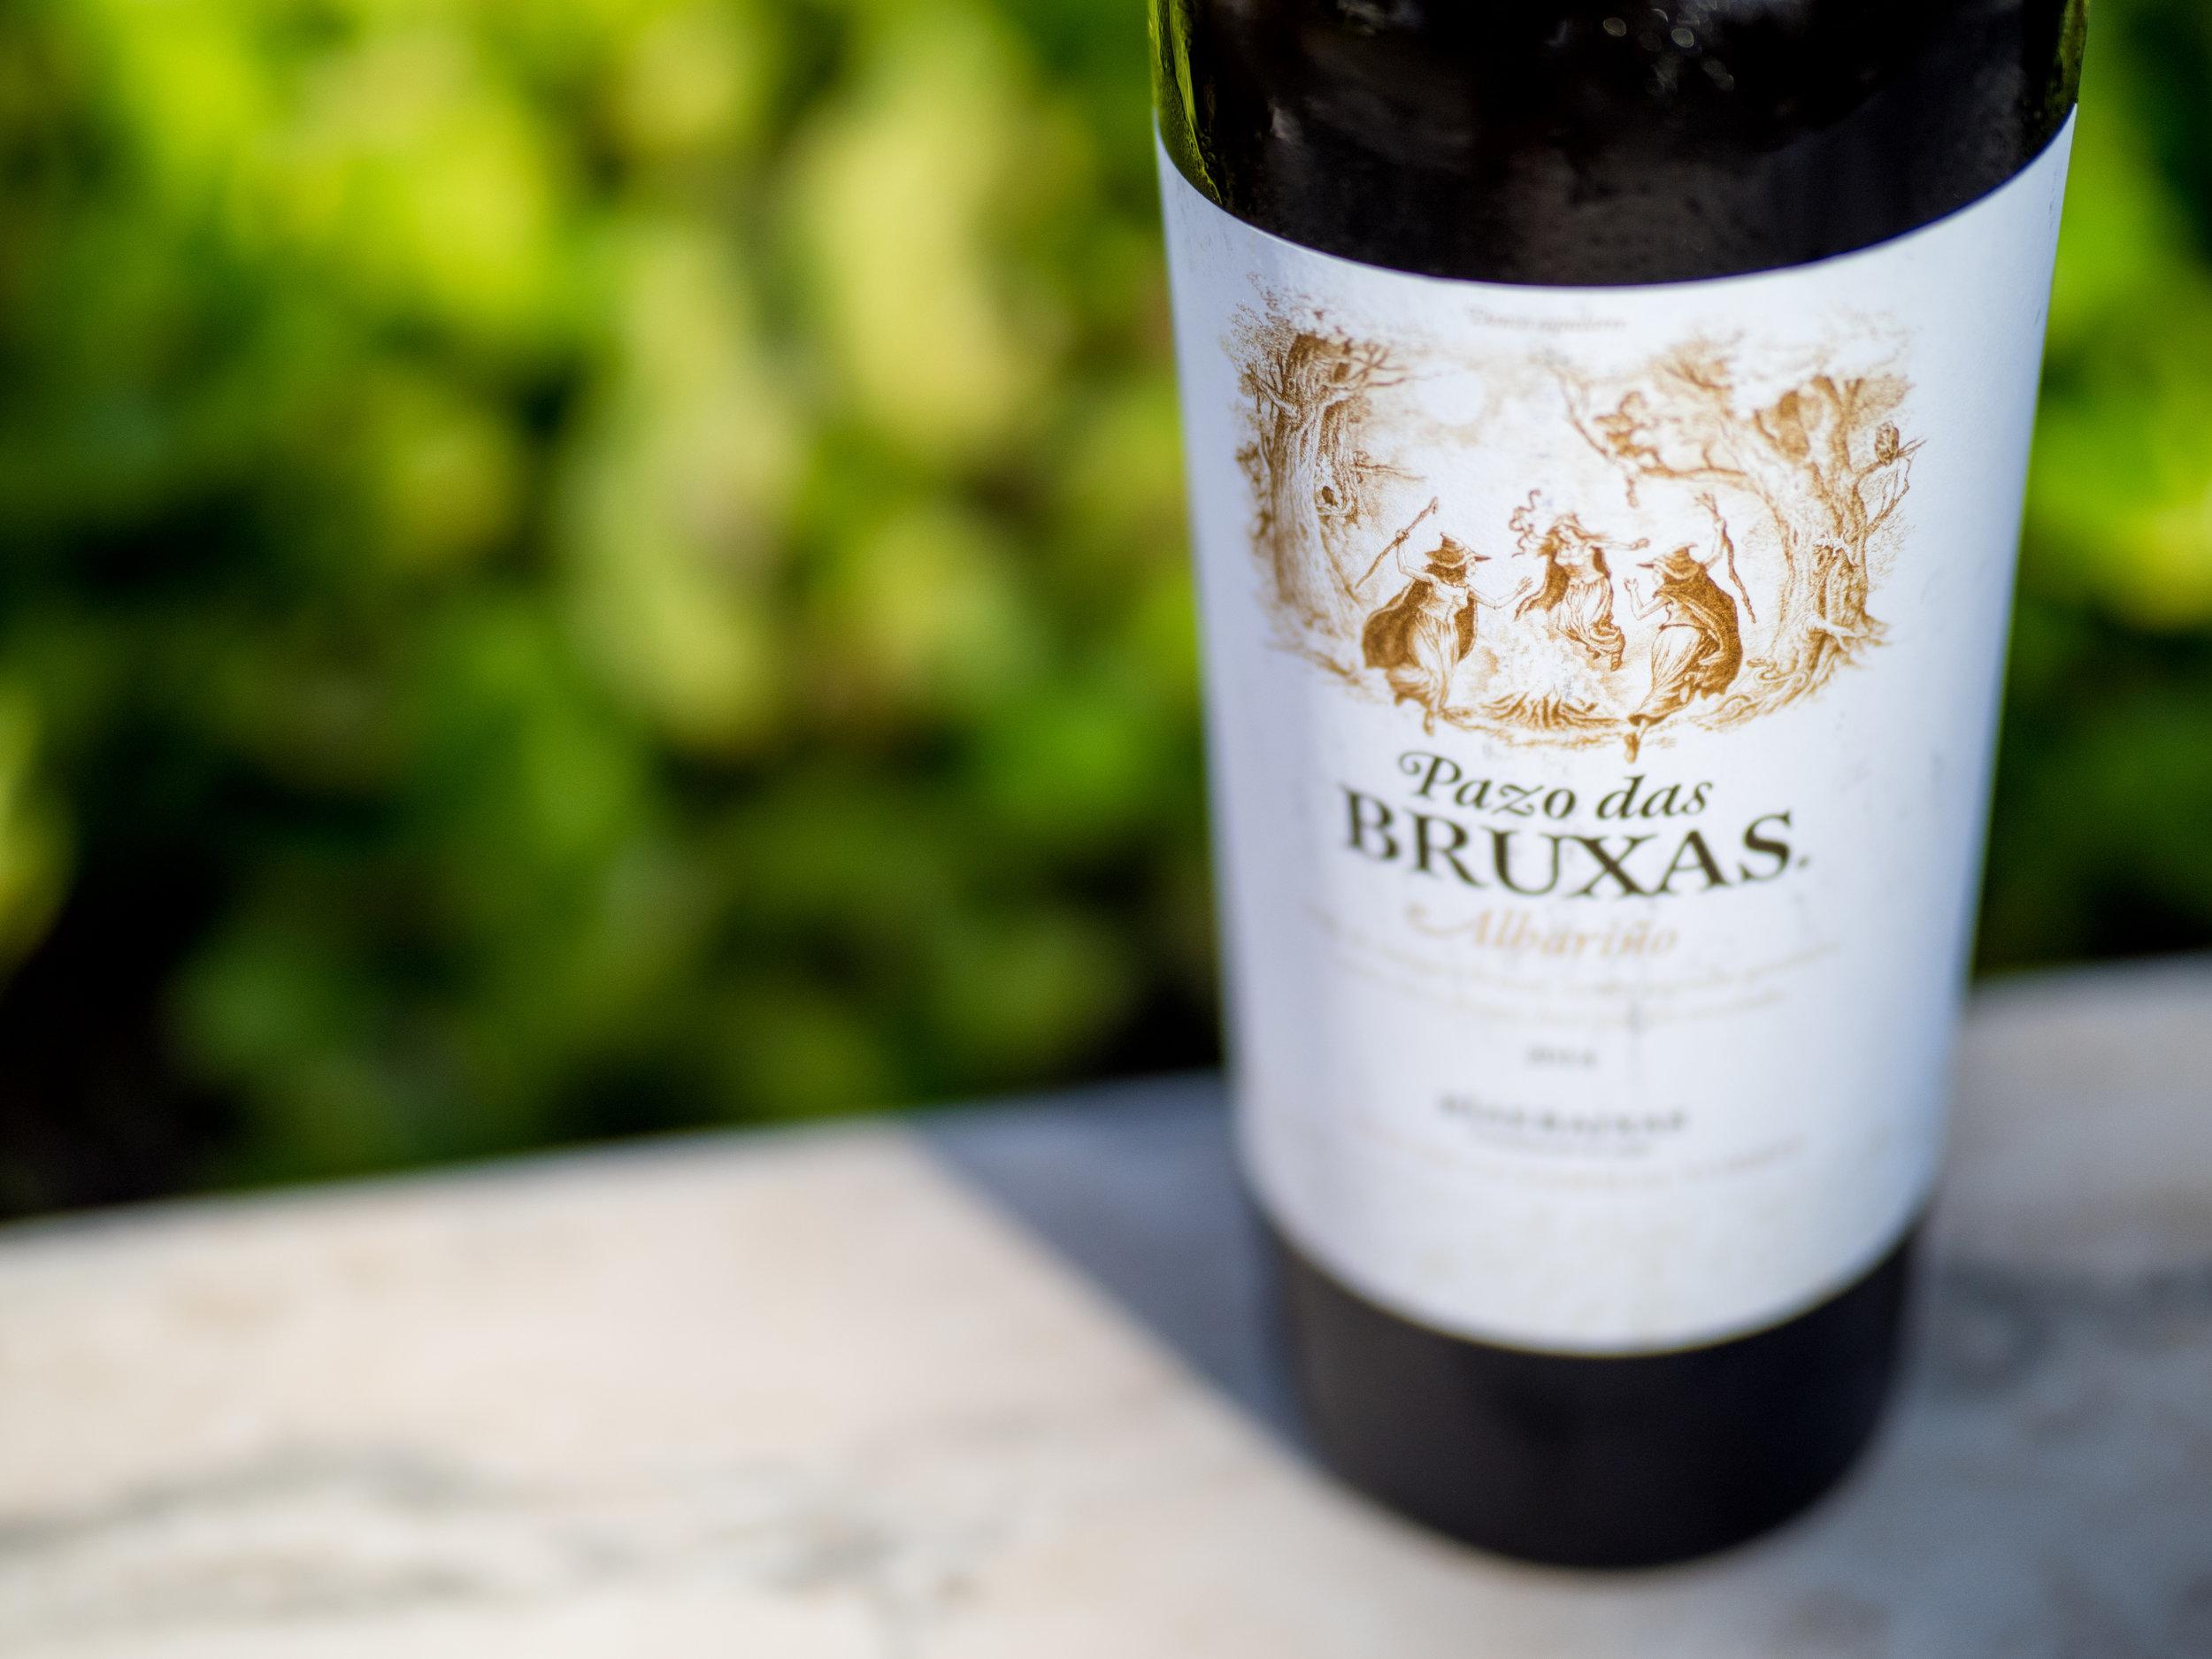 Musings by the Glass - Costco Corner - Palo das Bruxas Albarino from Rias Baixas, Spain